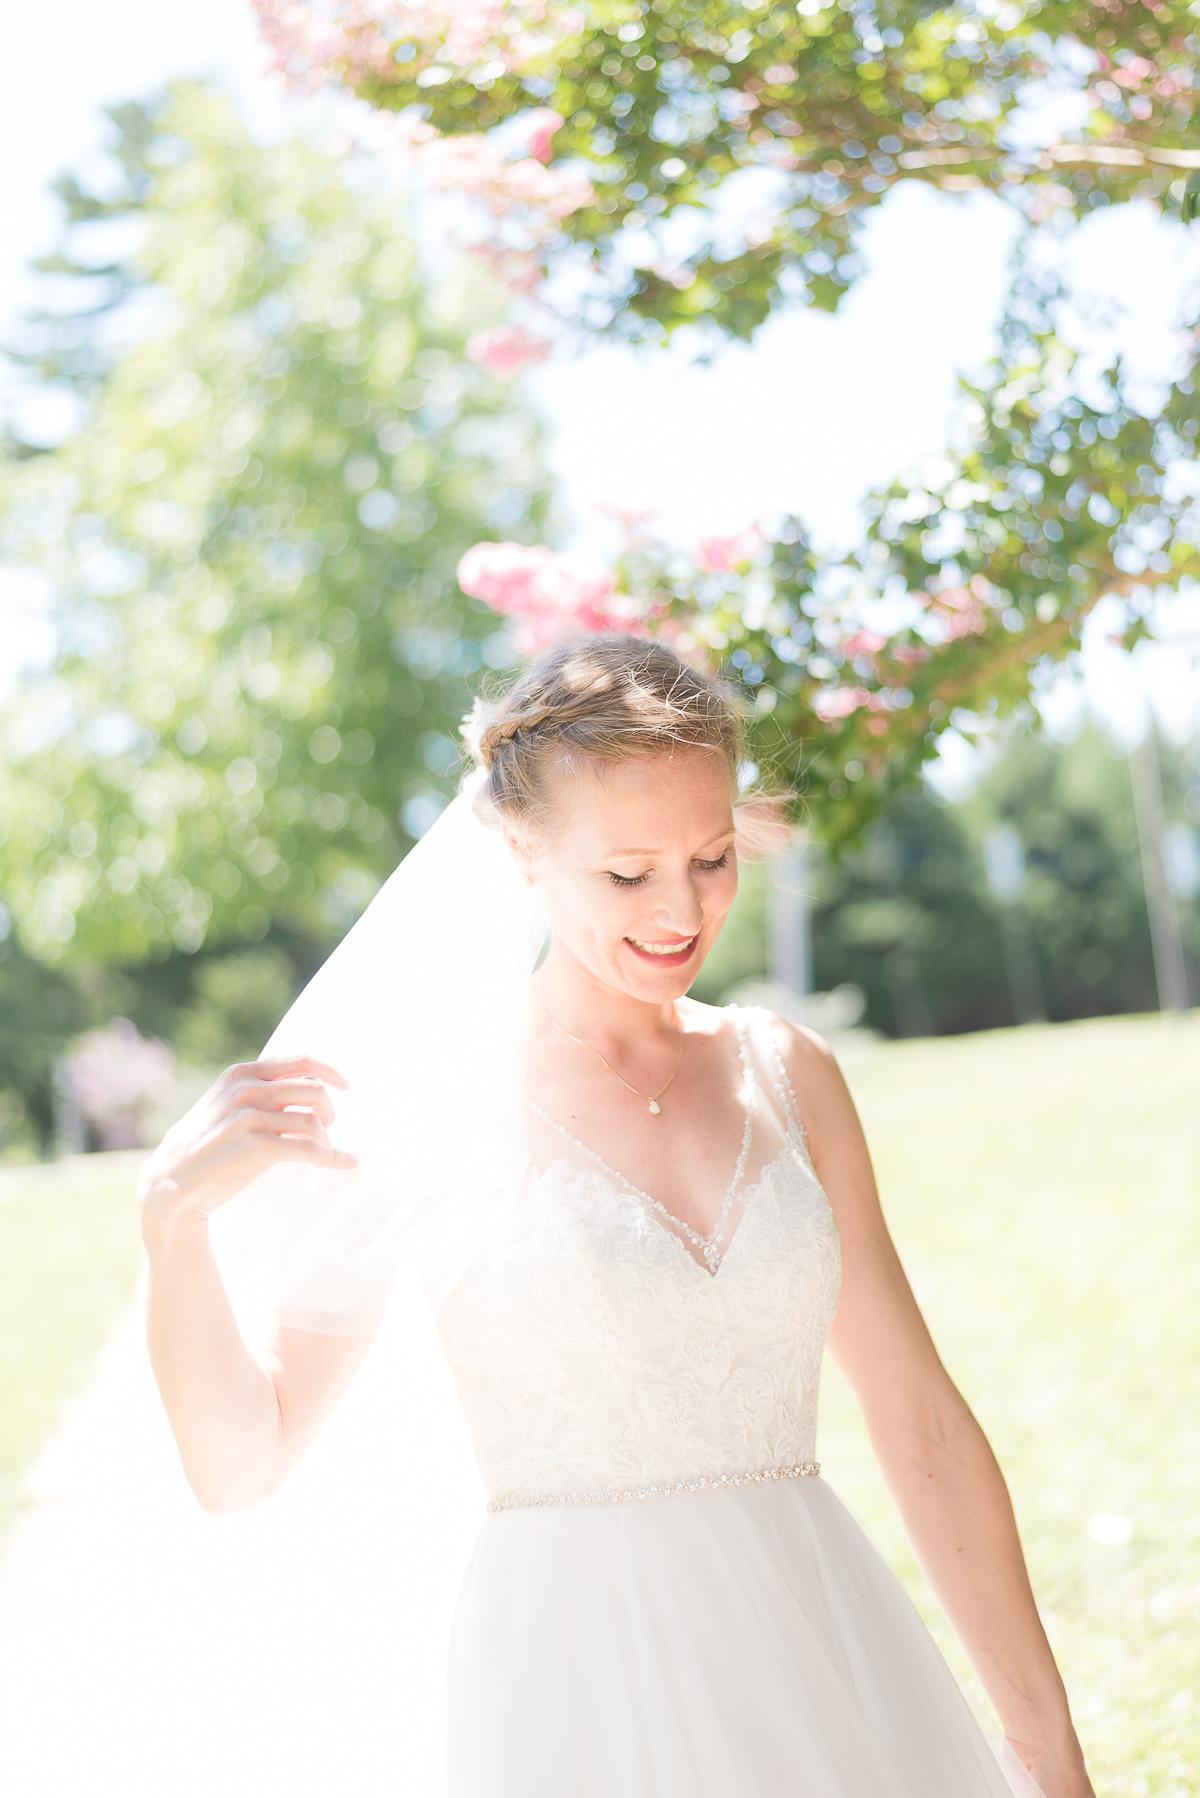 Elkridge-Furnace-Inn-Wedding-Reception-Bride-Groom-29